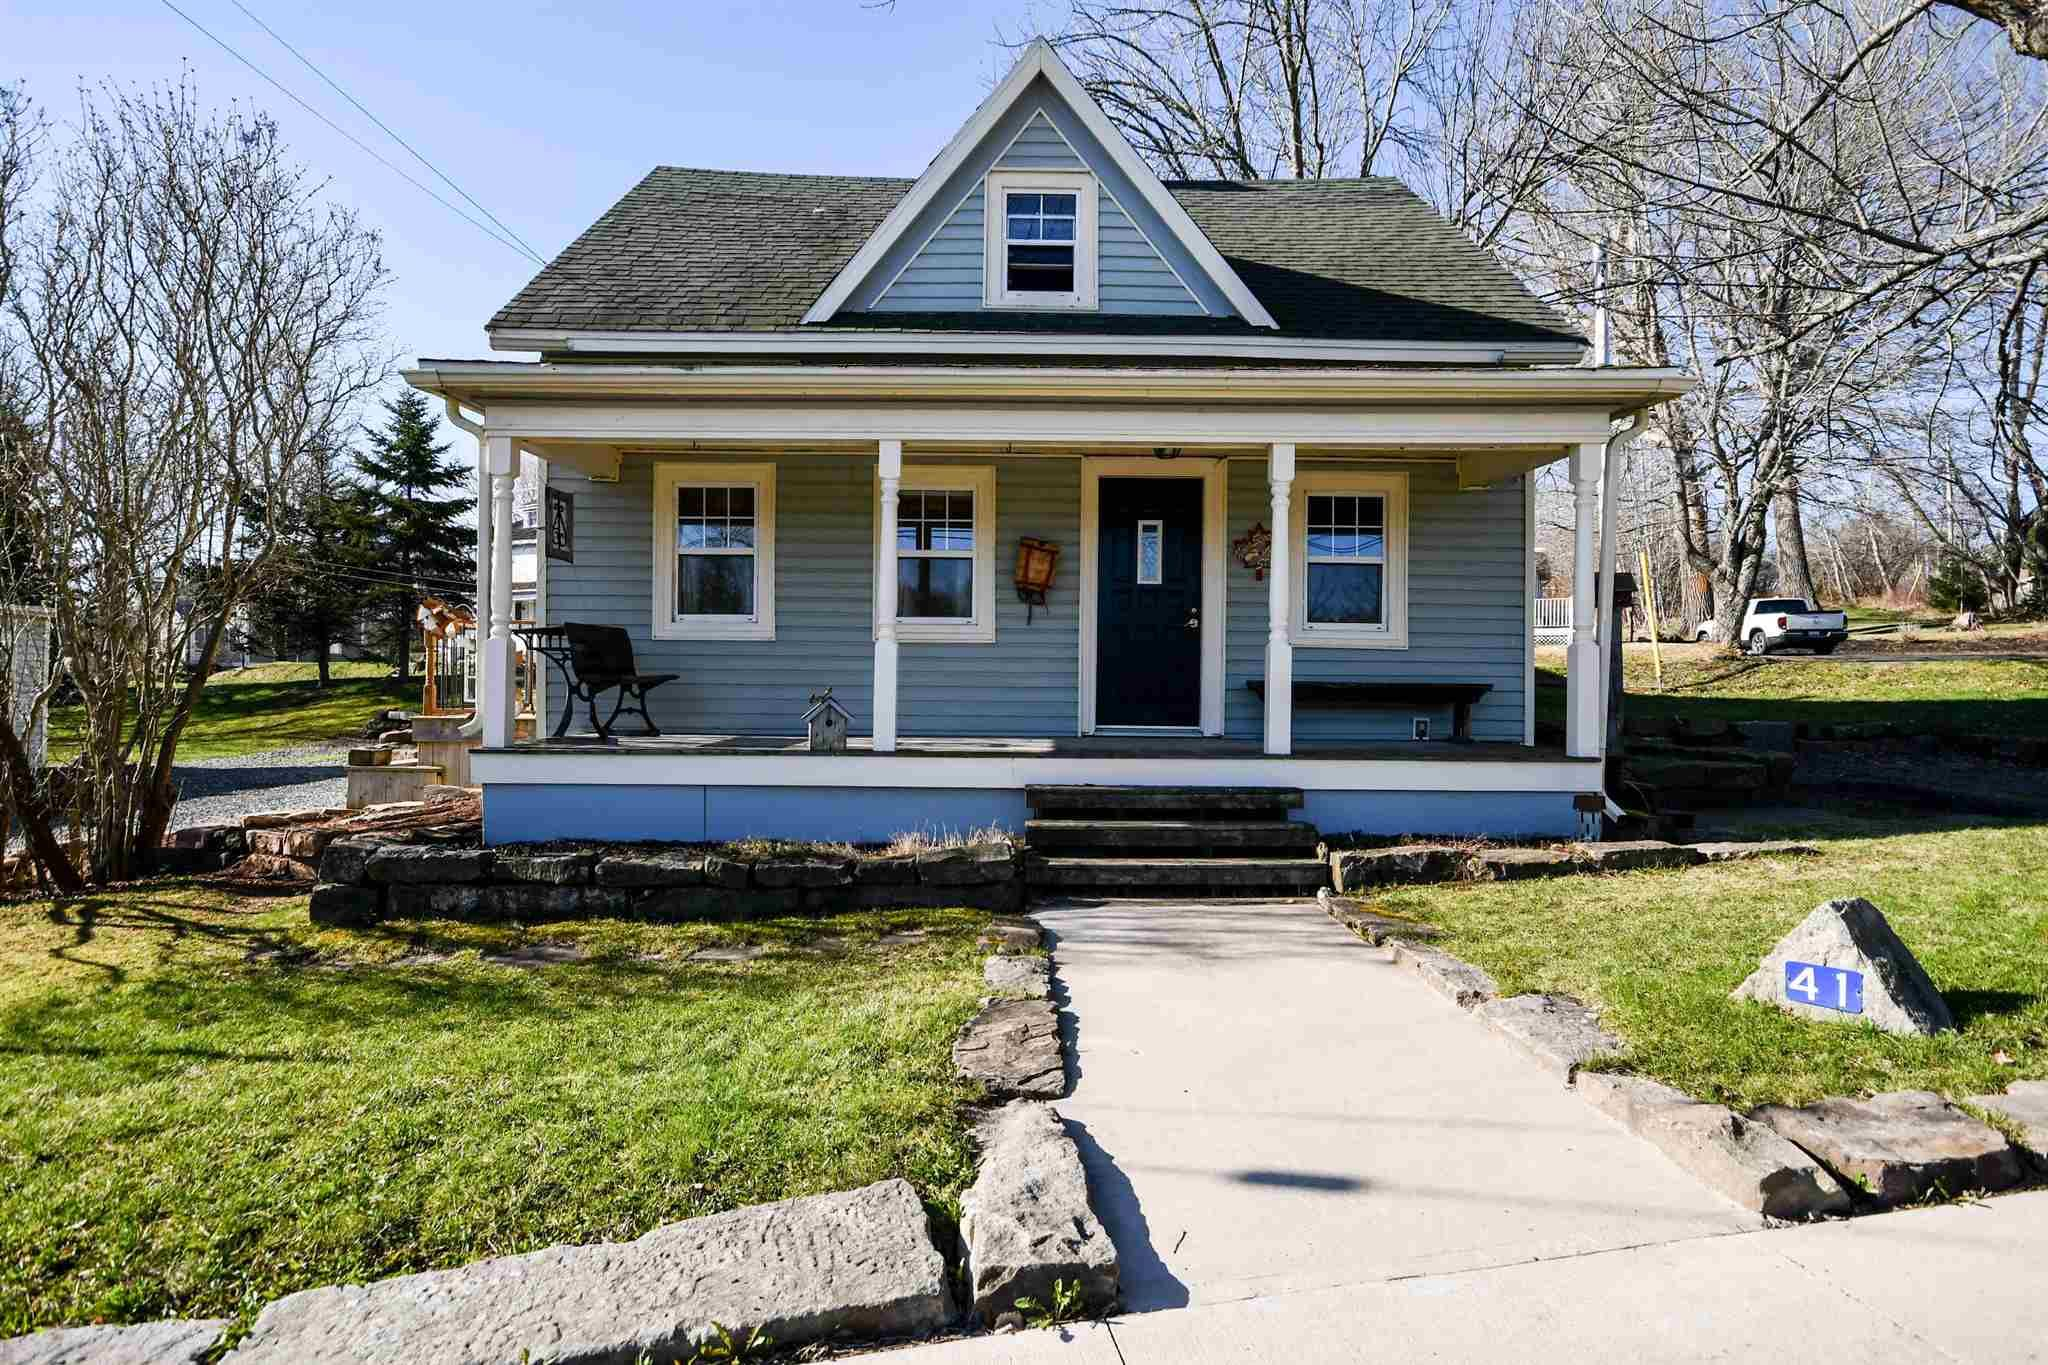 Main Photo: 41 School Street in Hantsport: 403-Hants County Residential for sale (Annapolis Valley)  : MLS®# 202109379